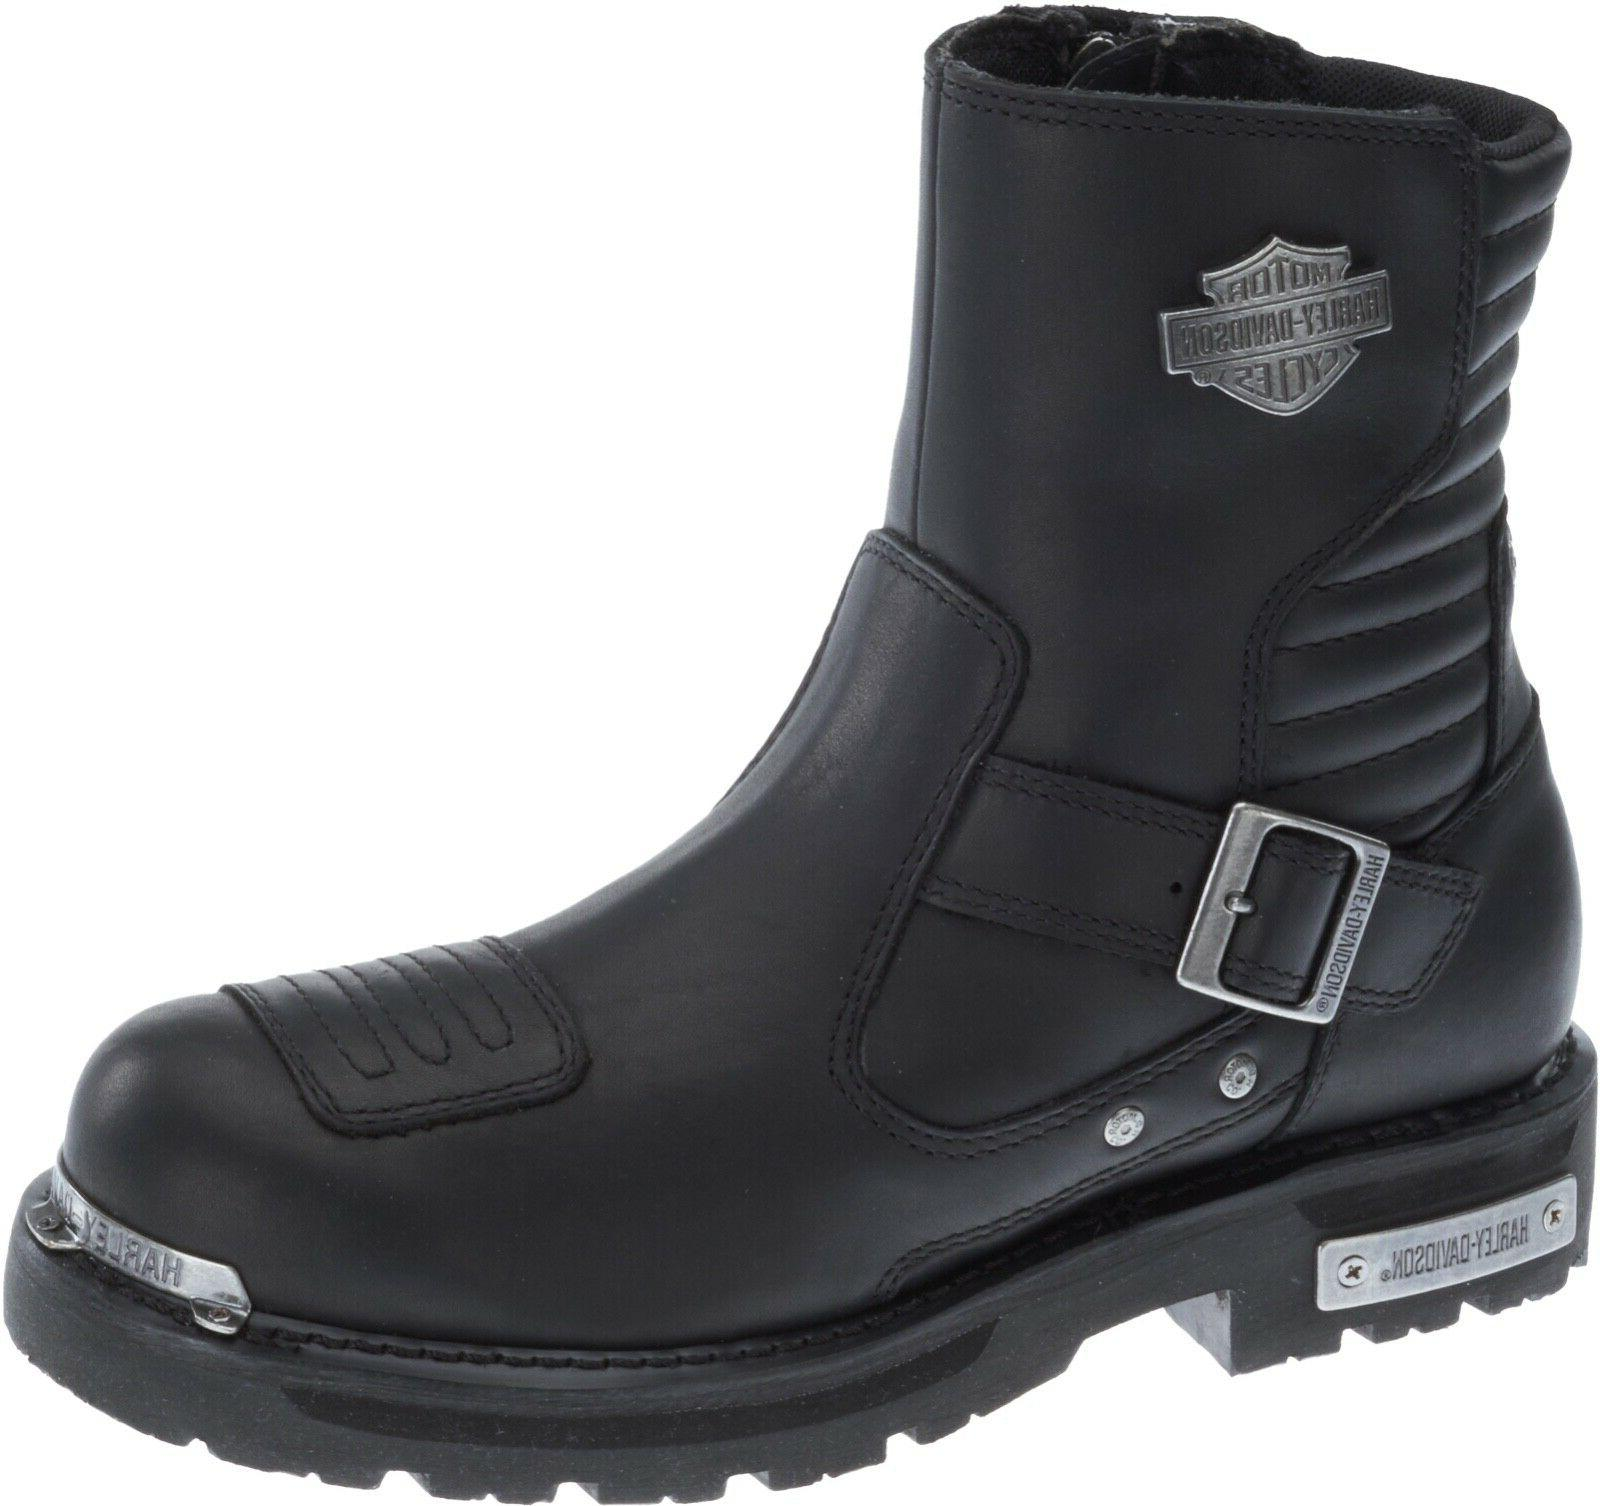 new harley davidson men s motorcycle boots